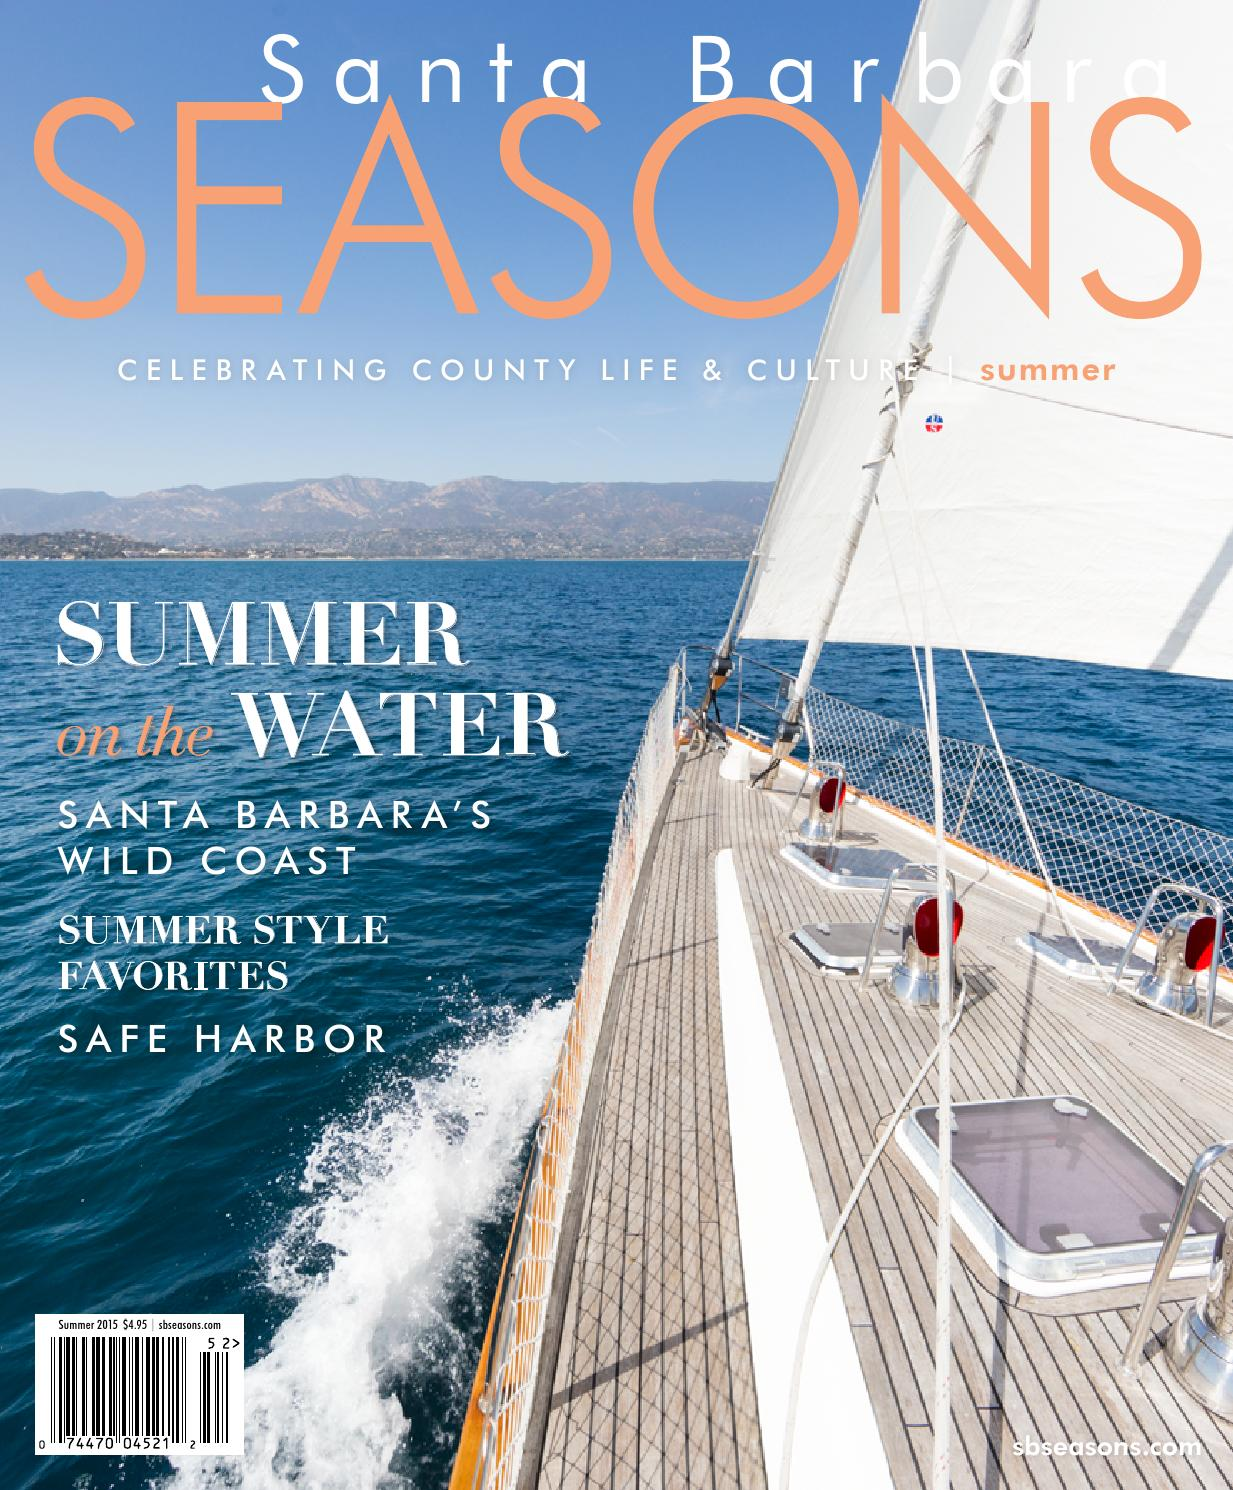 Santa Barbara SEASONS Magazine Summer 2015 By Sbseasons